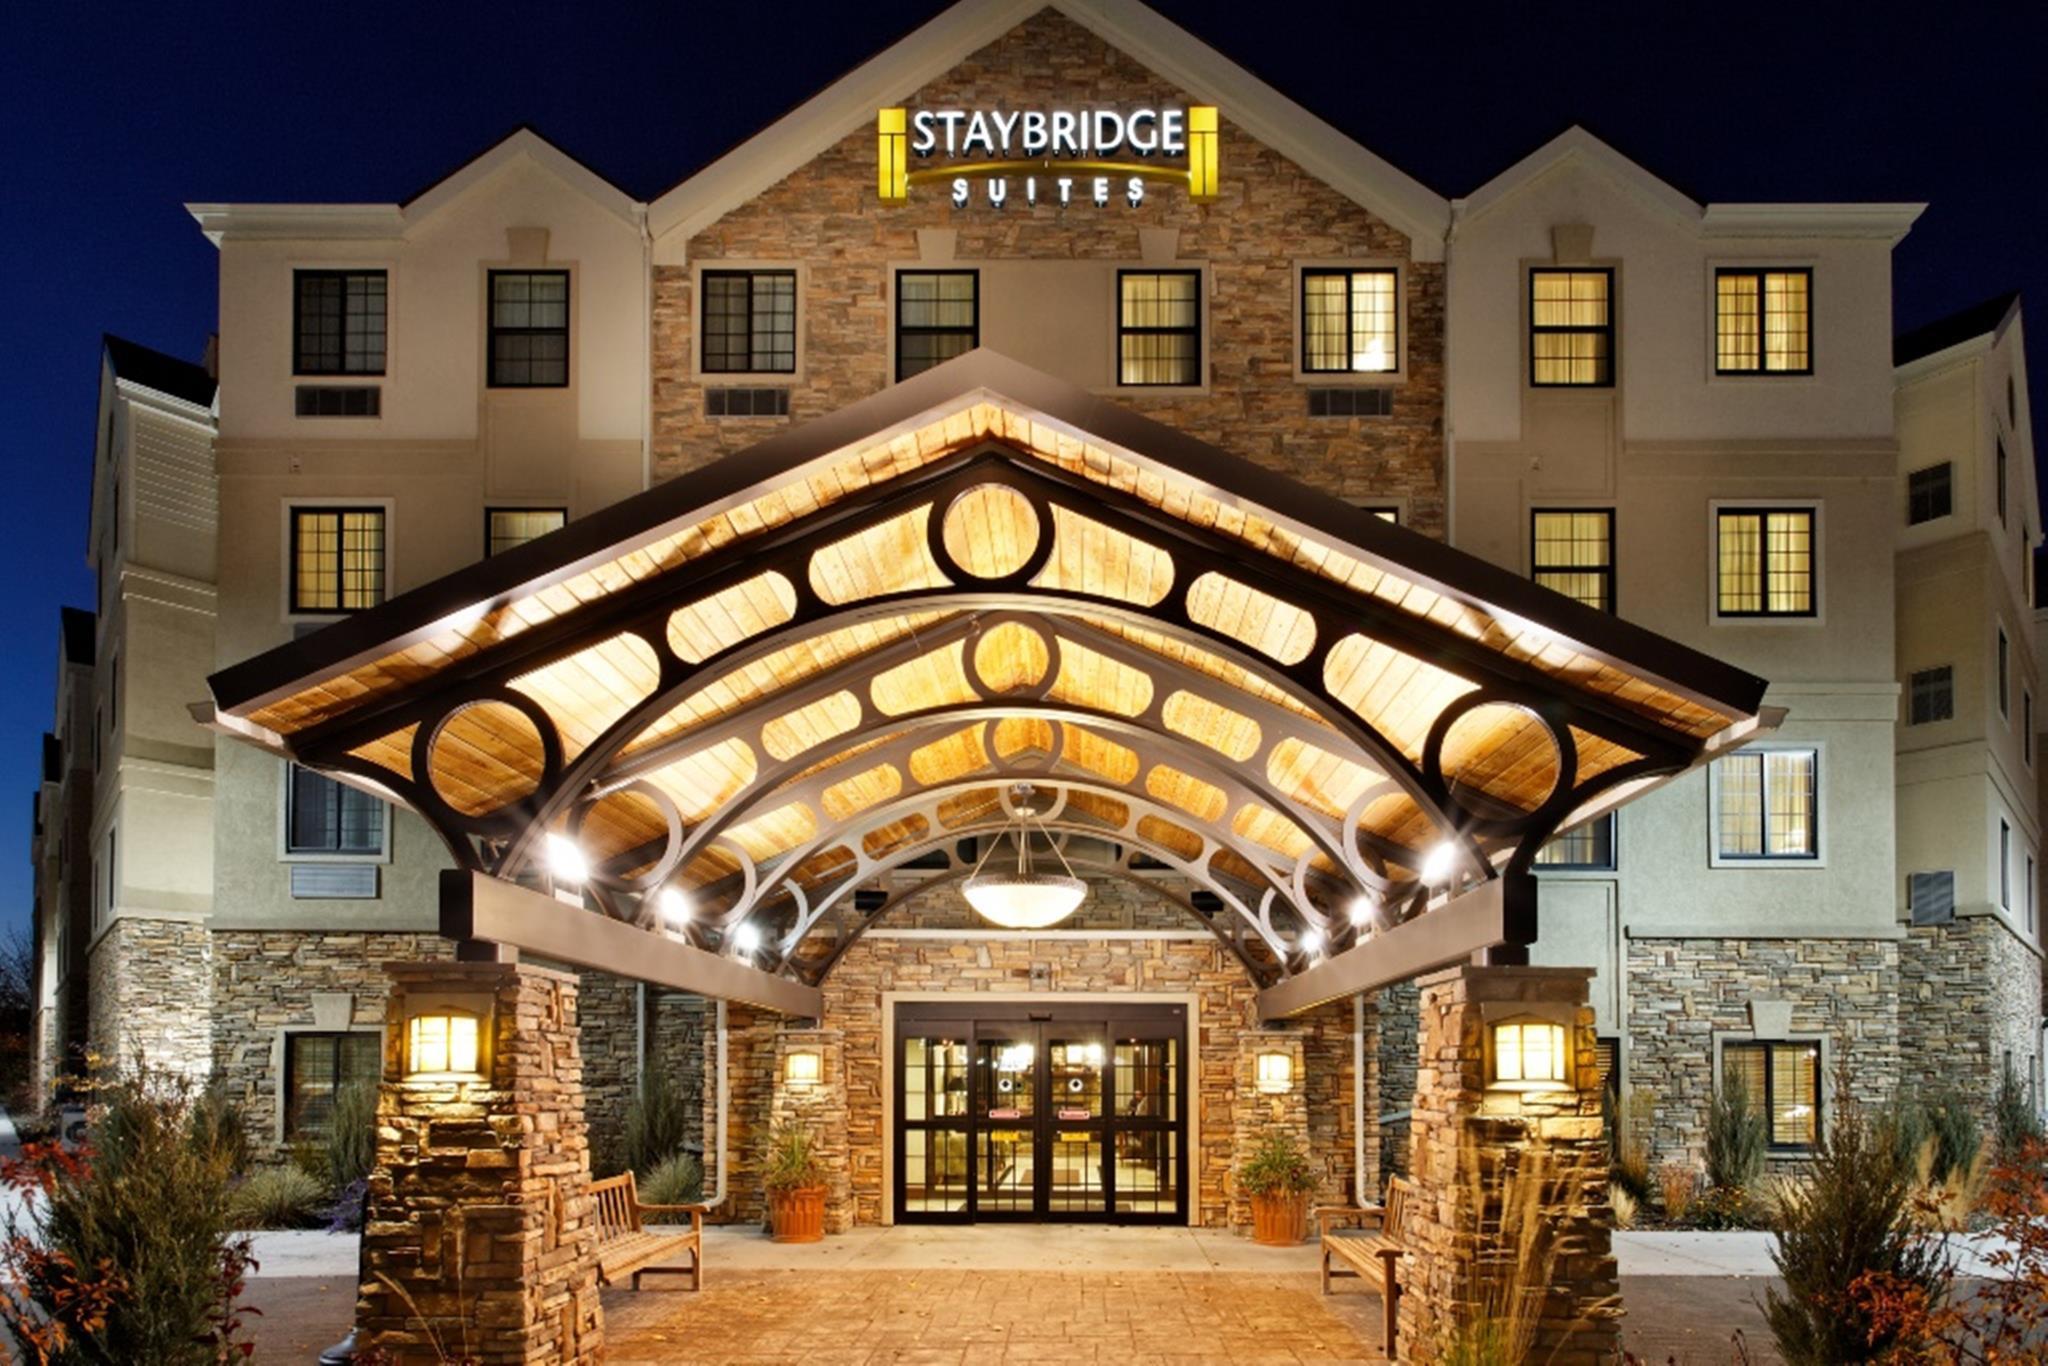 Staybridge Suites Toledo   Rossford   Perrtsburg